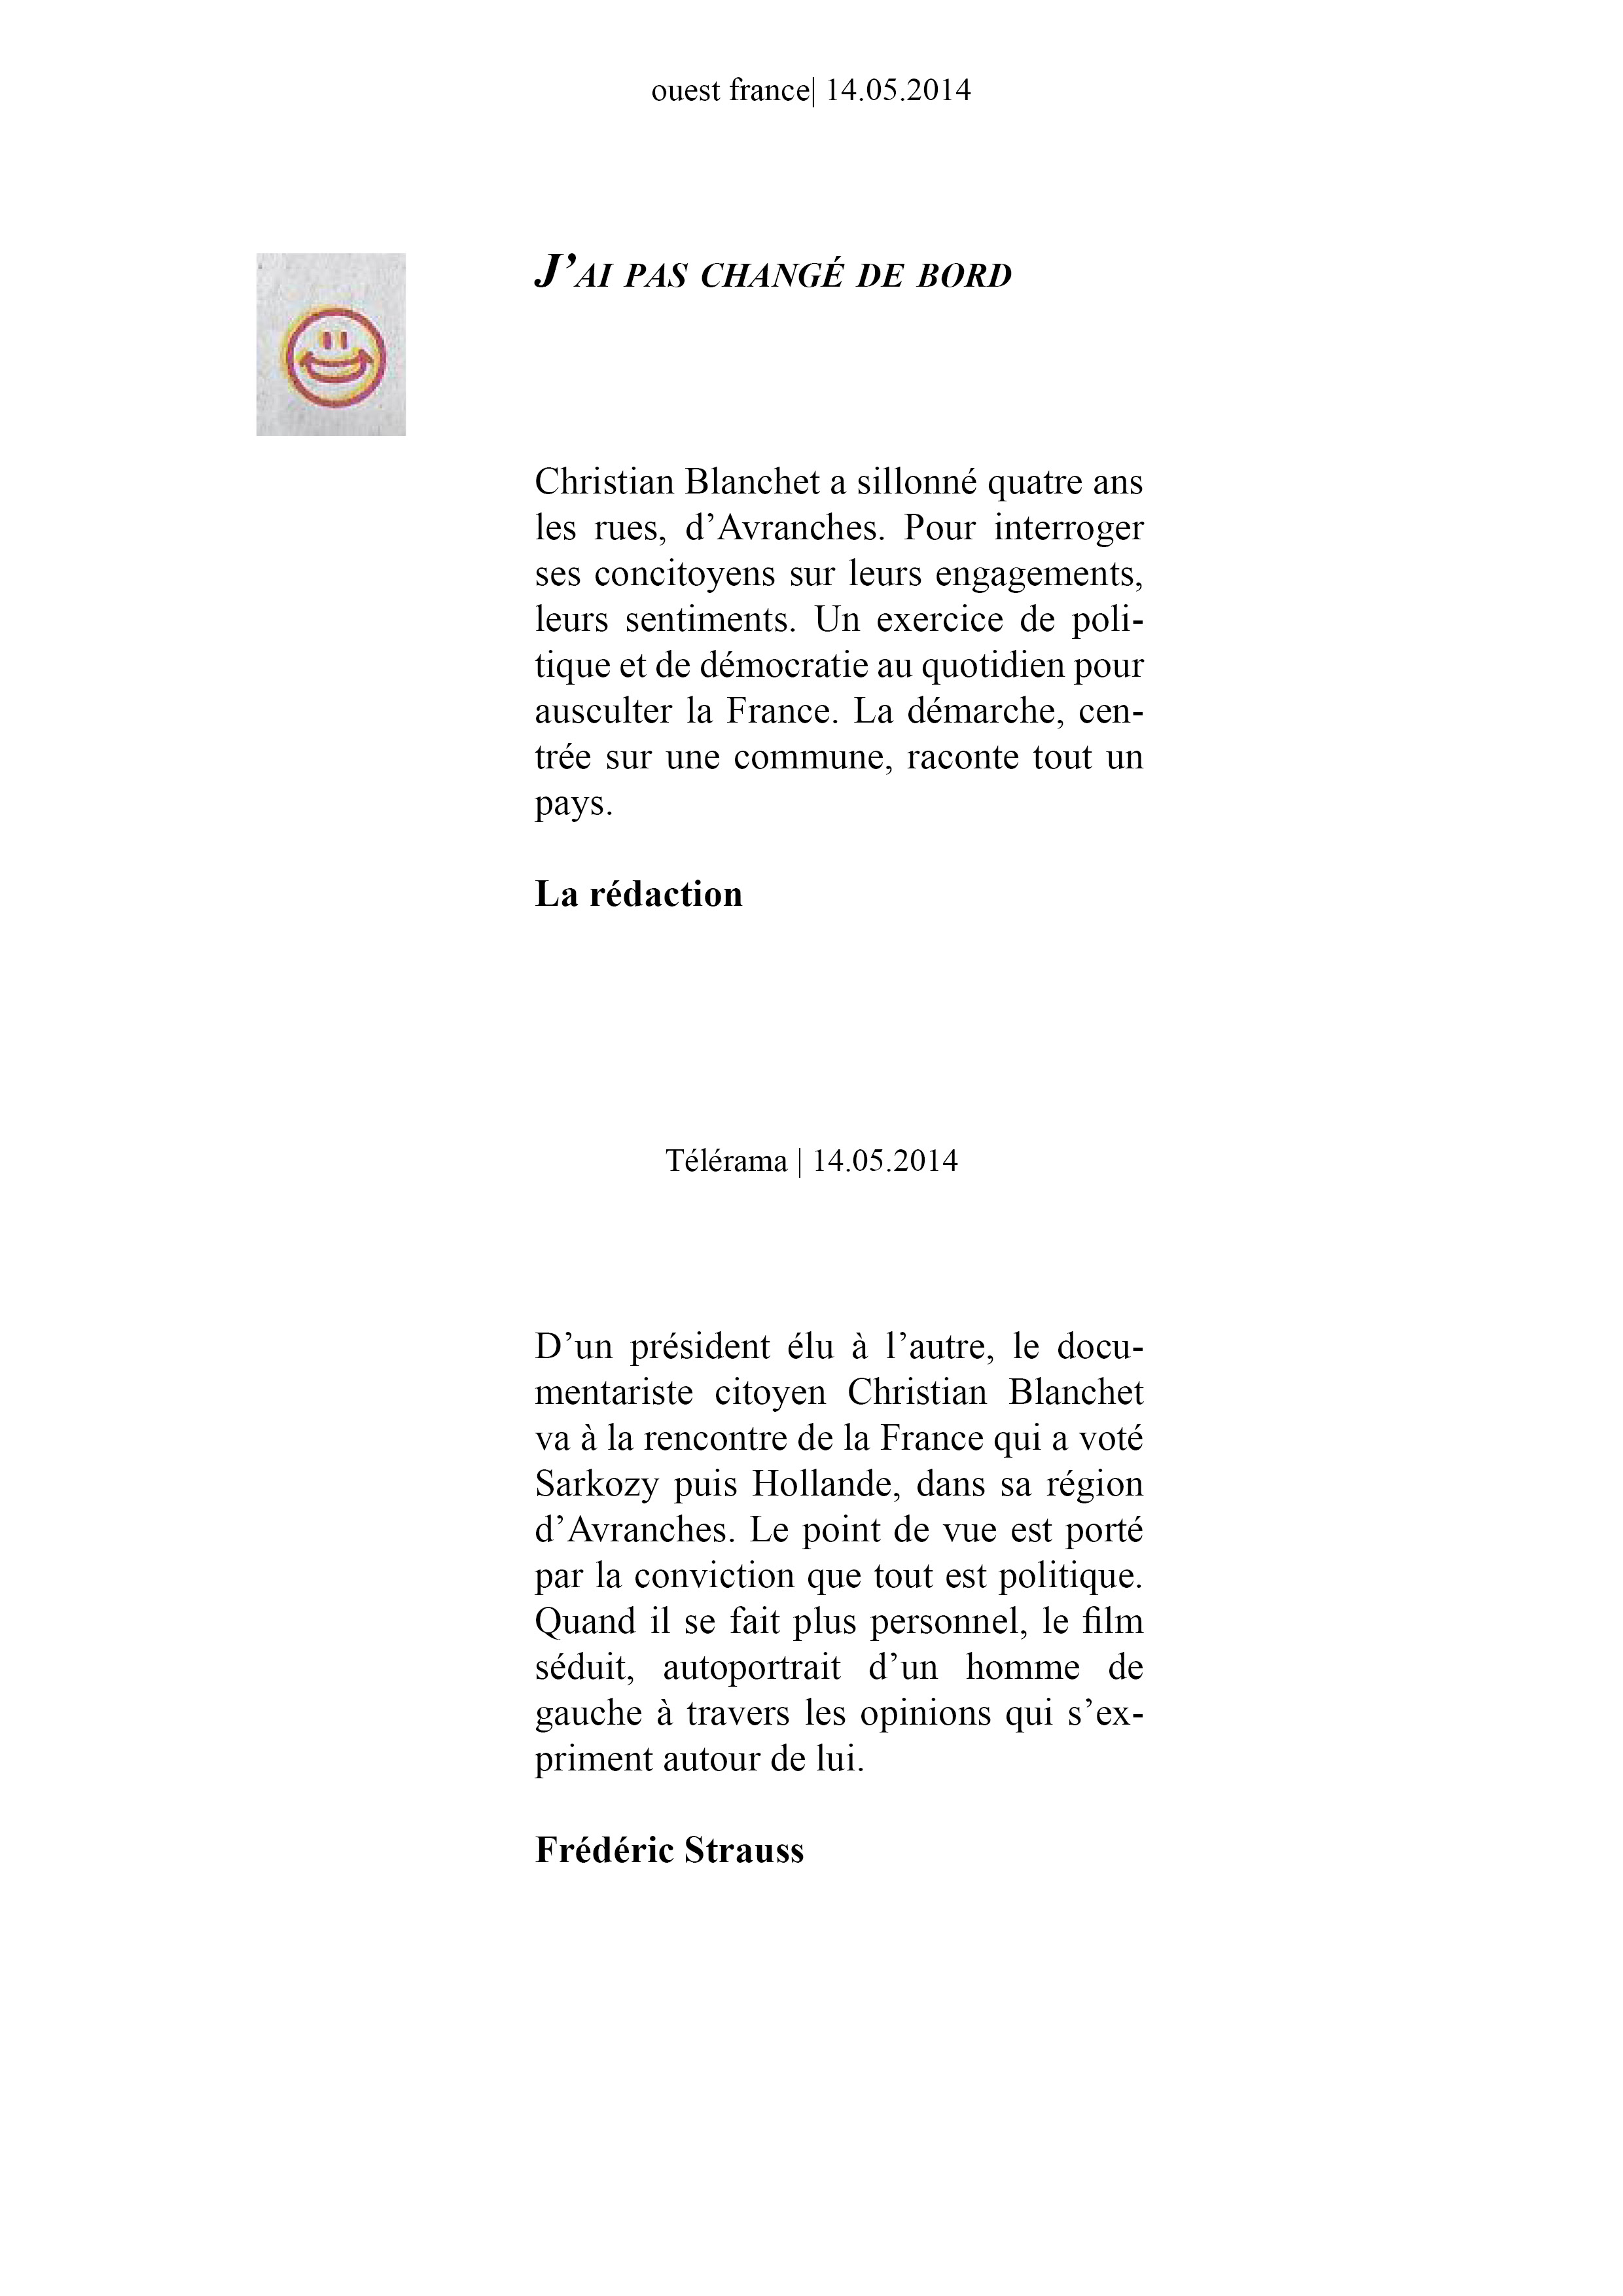 Ouest France et télérama 14 mai 2014